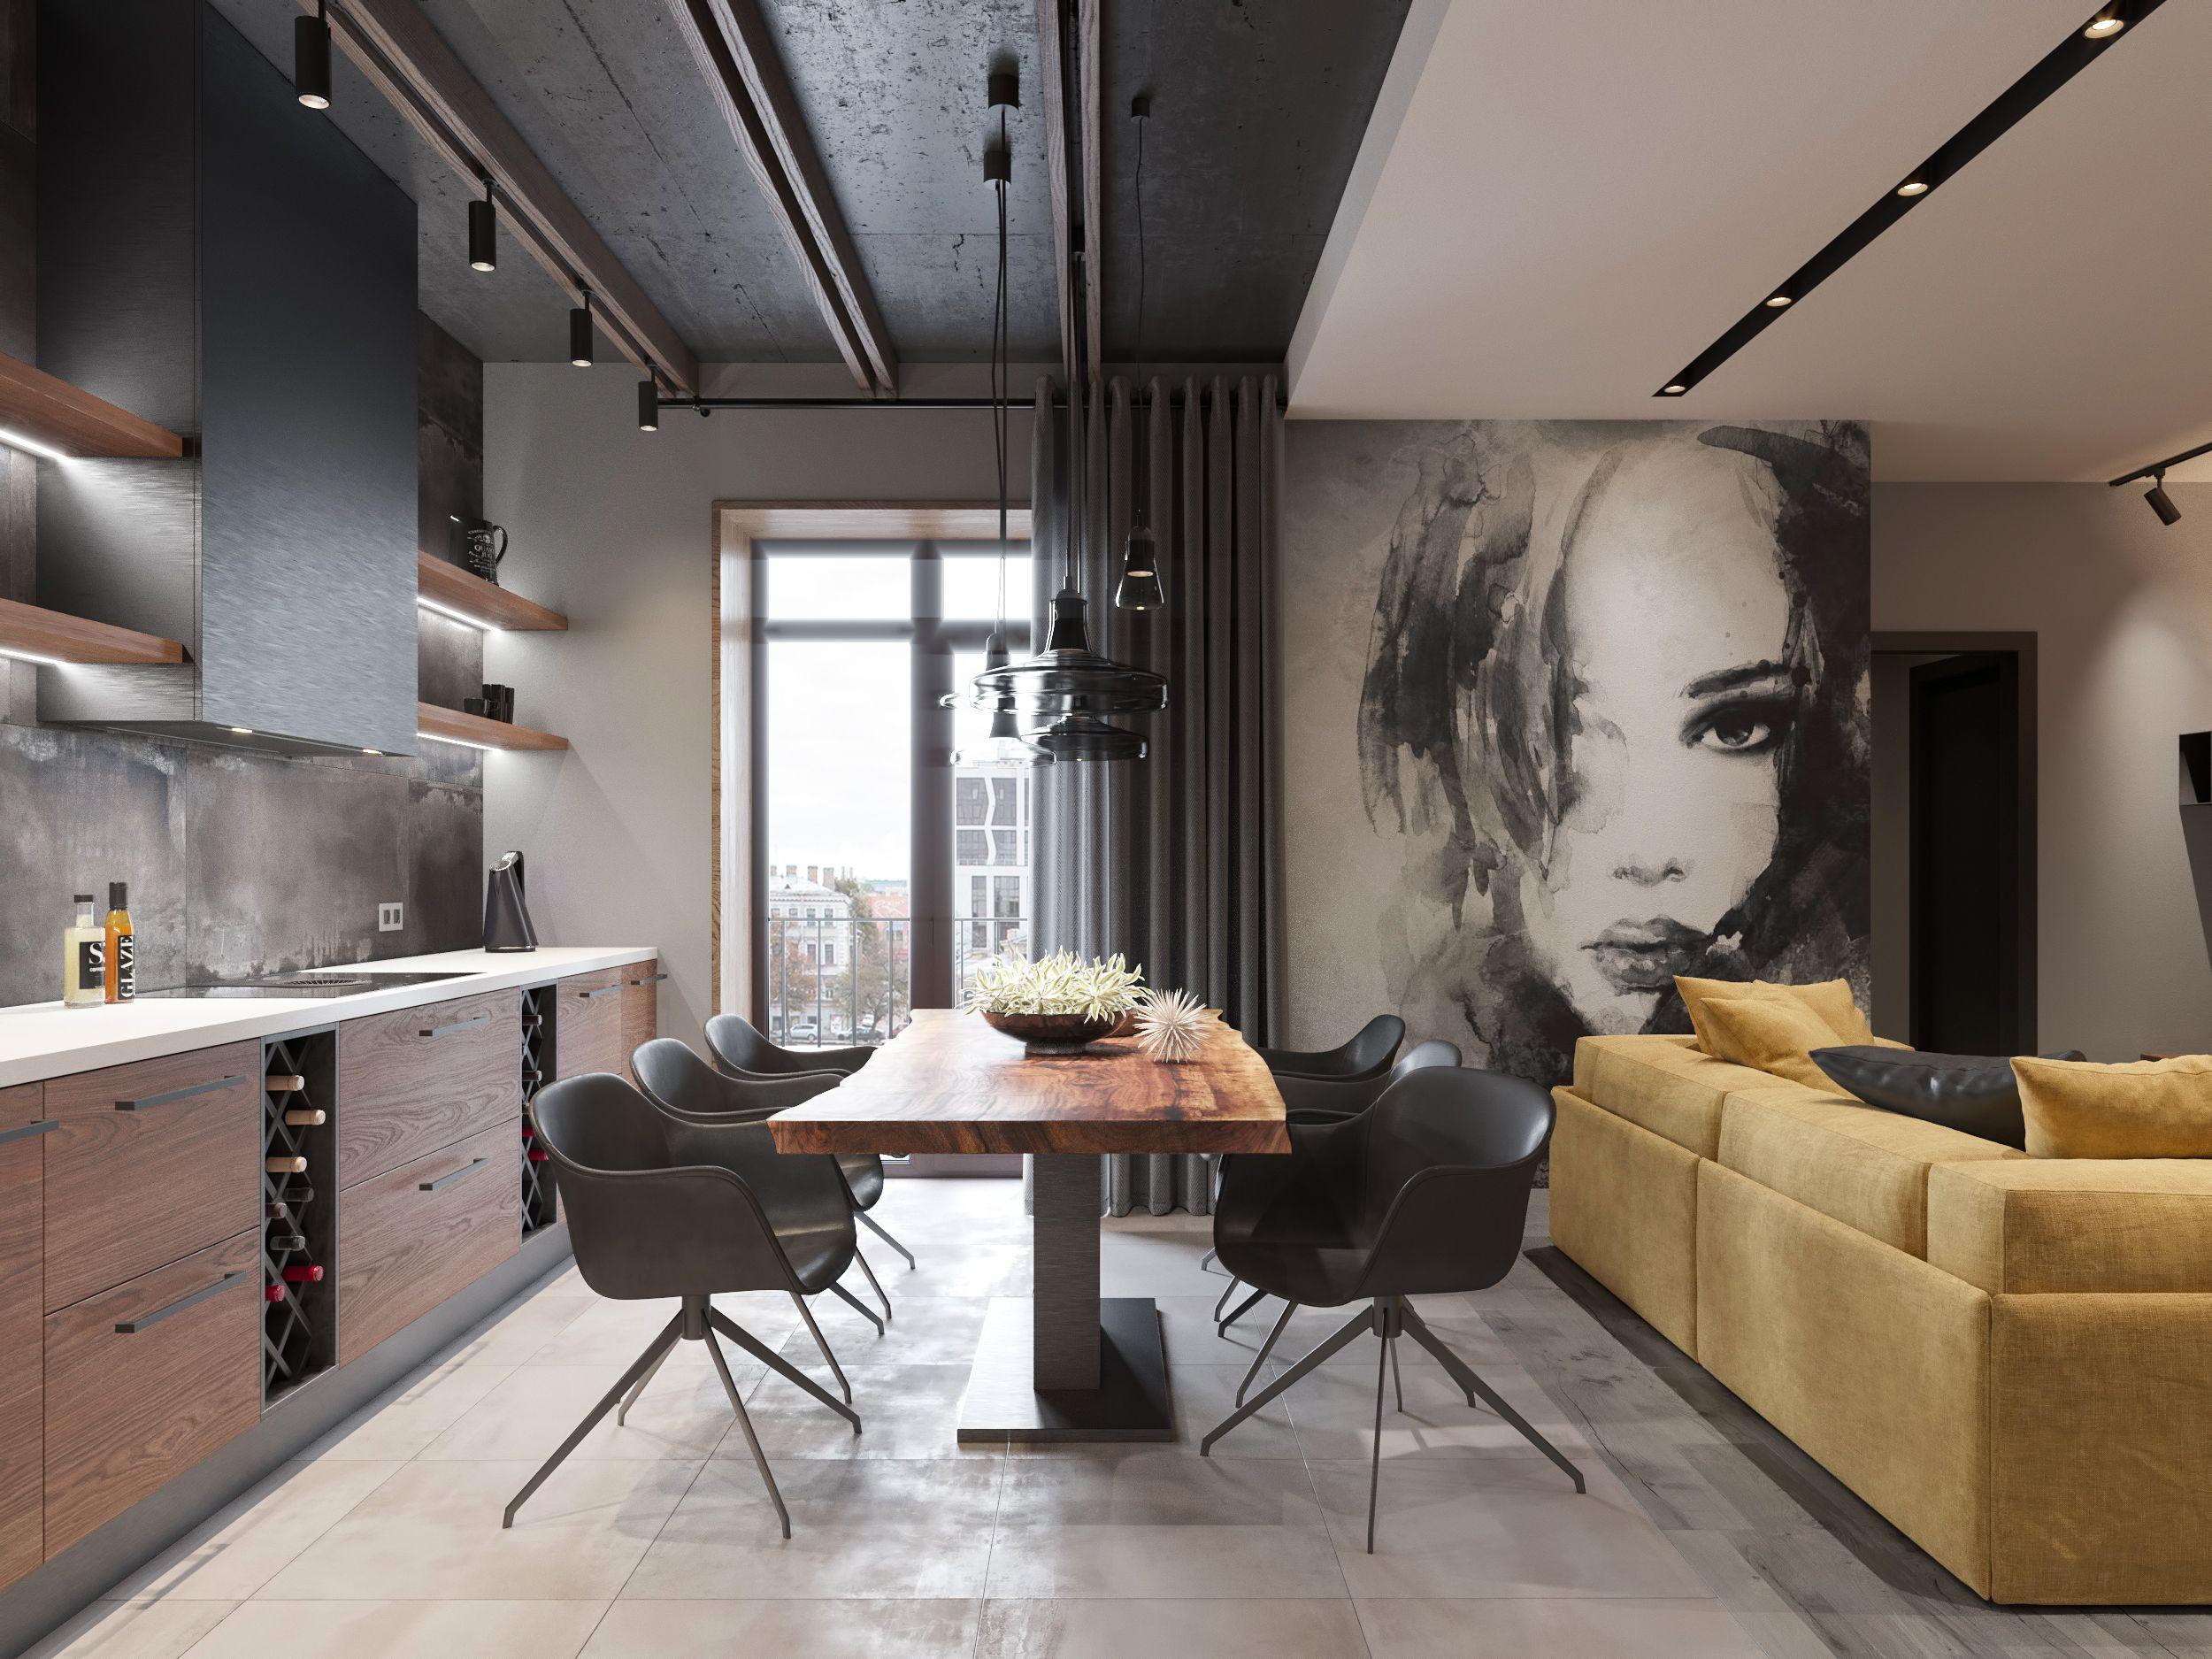 Loft Interior 2 On Behance Loft Interior Design Apartment